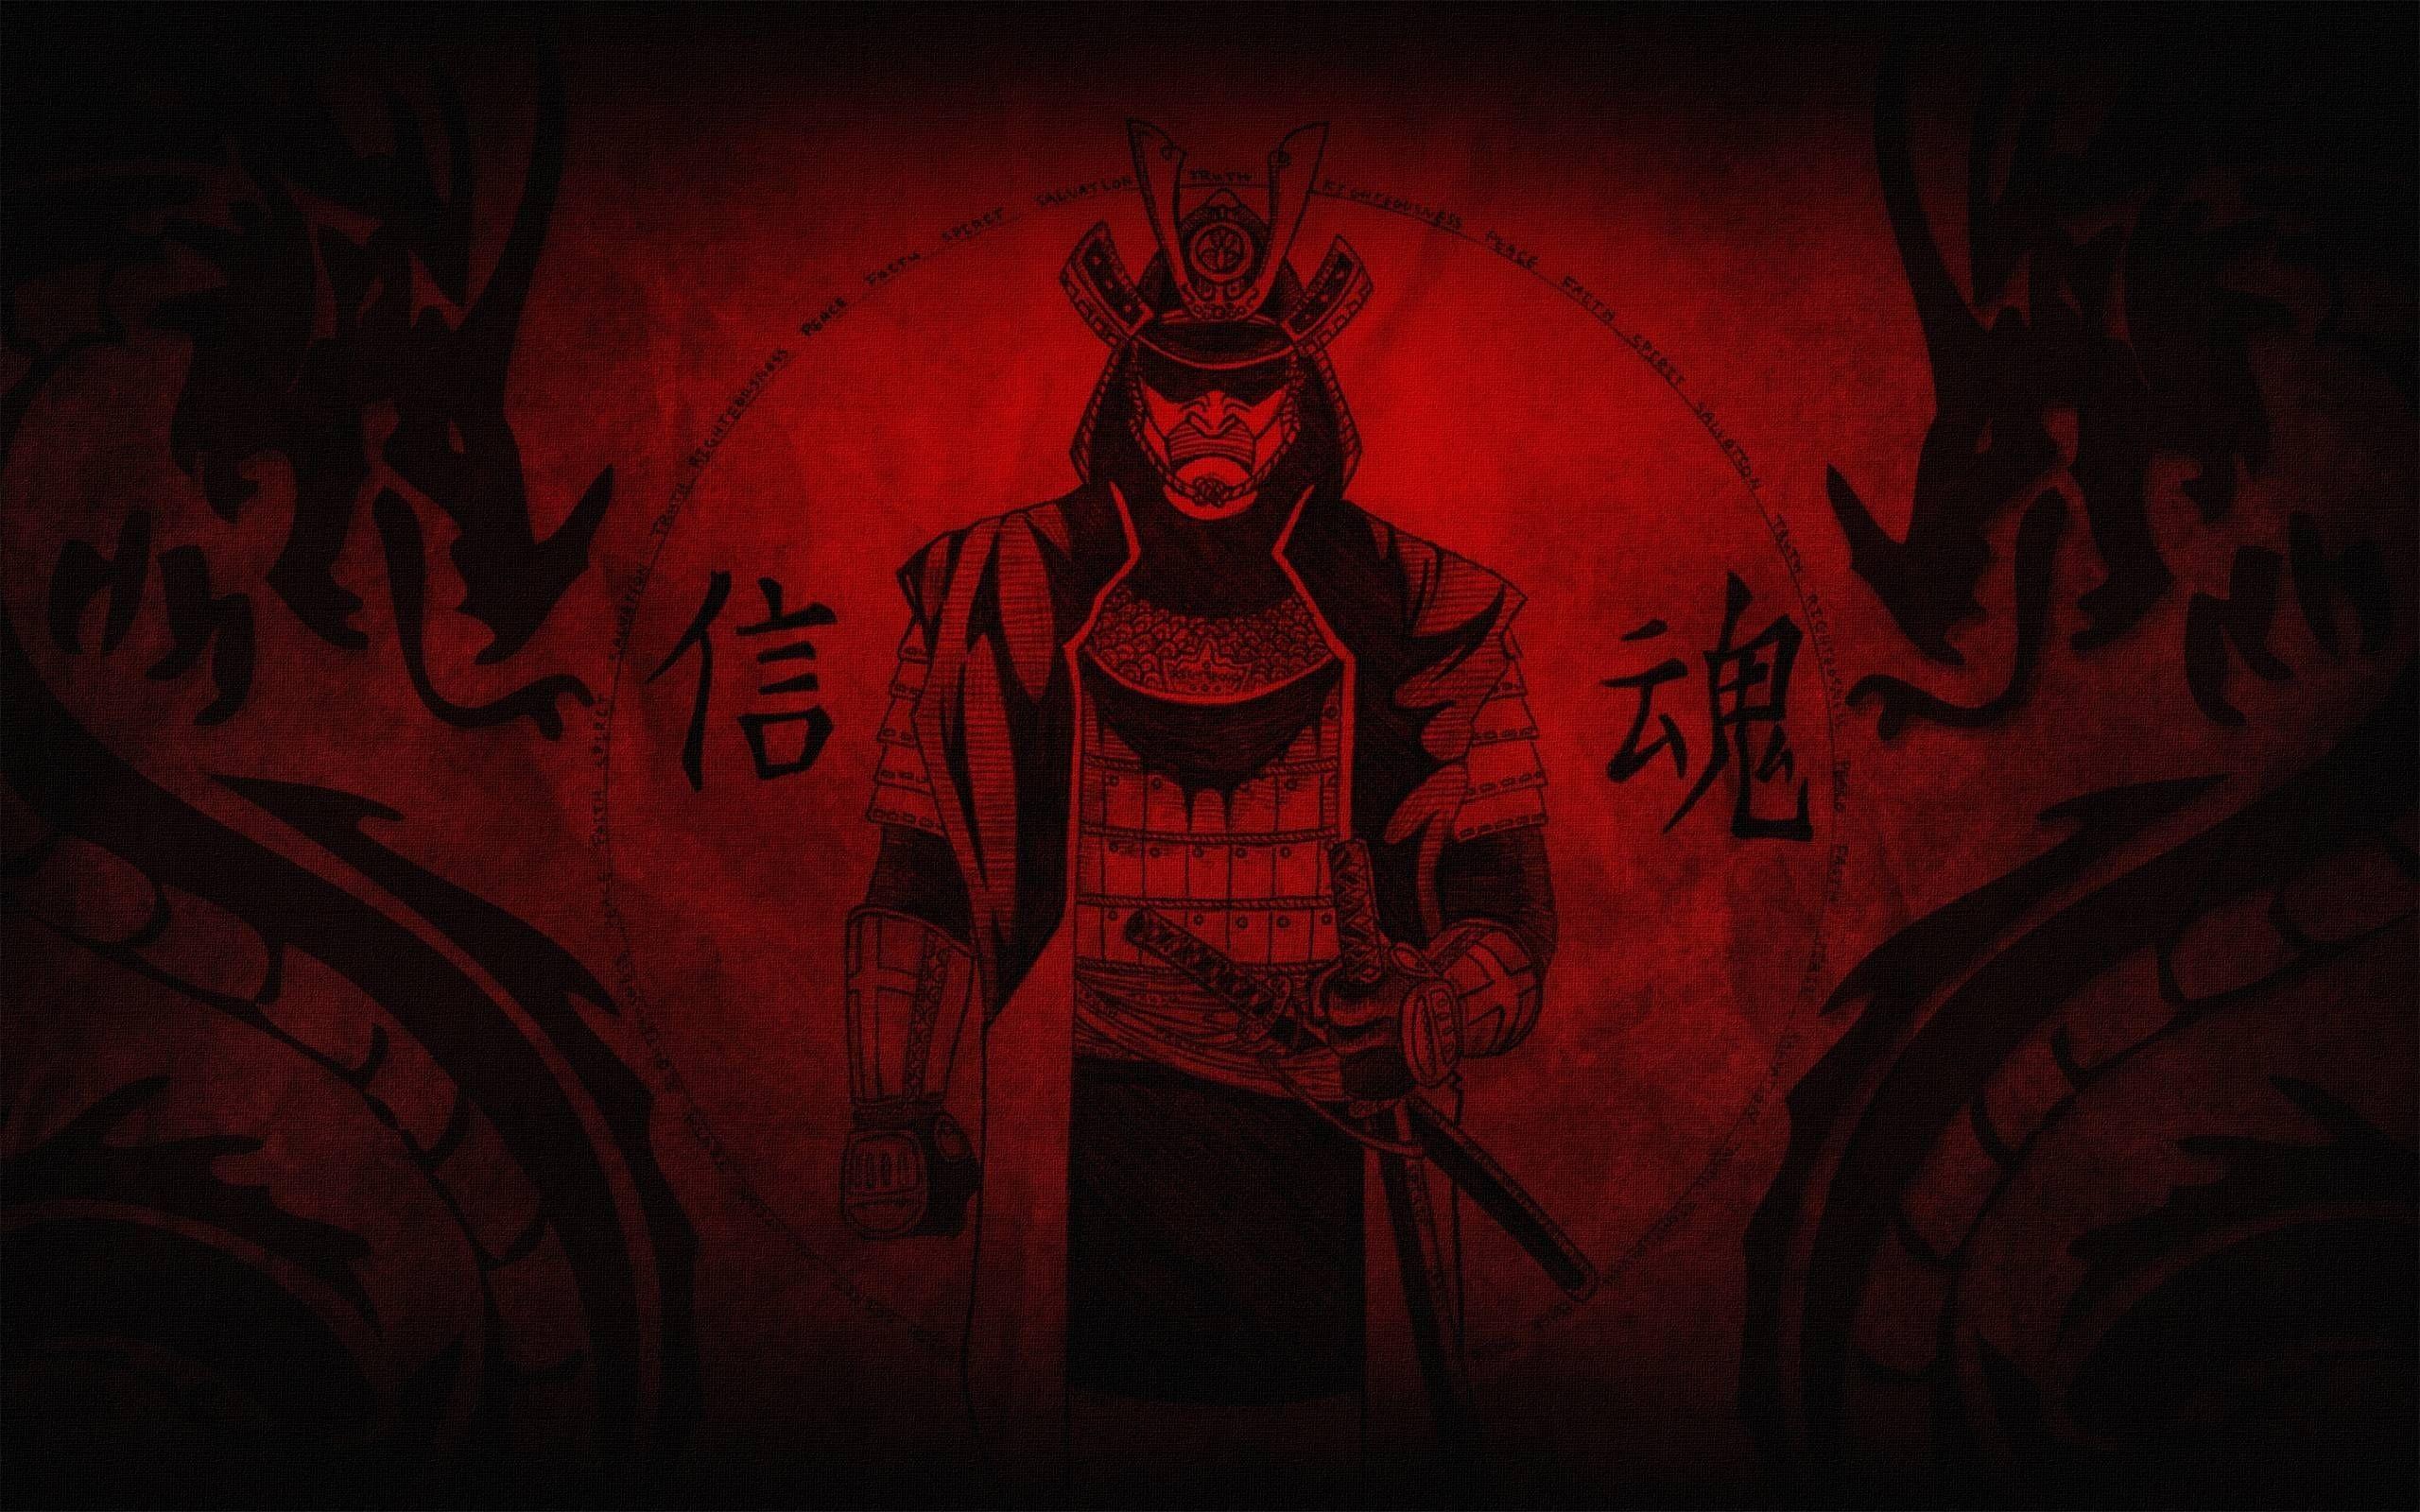 Res: 2560x1600, 1920x1080 Samurai Champloo Mugen Wallpapers - Wallpaper Cave